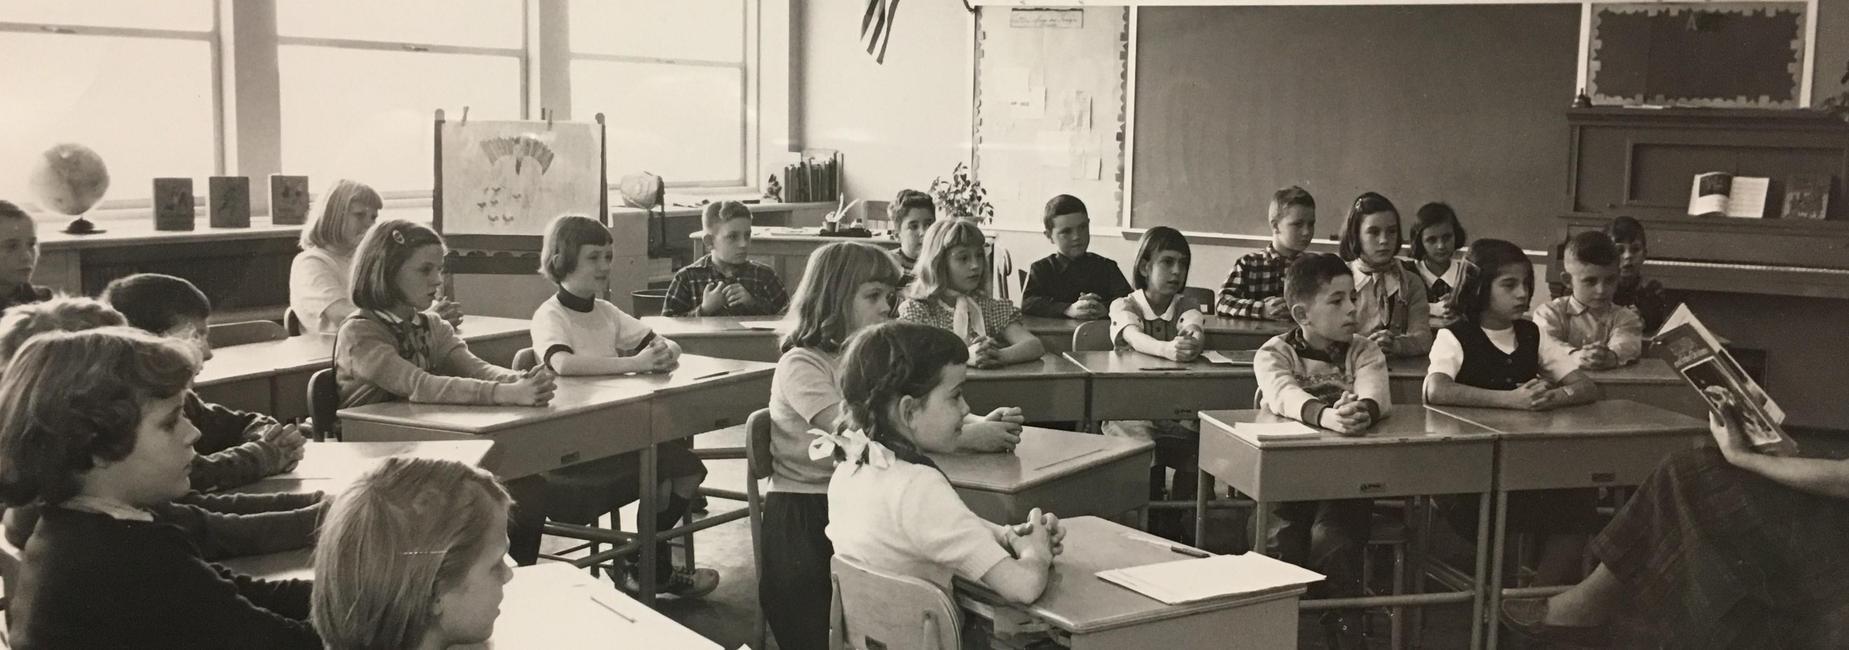 School photo circa 1950-60's